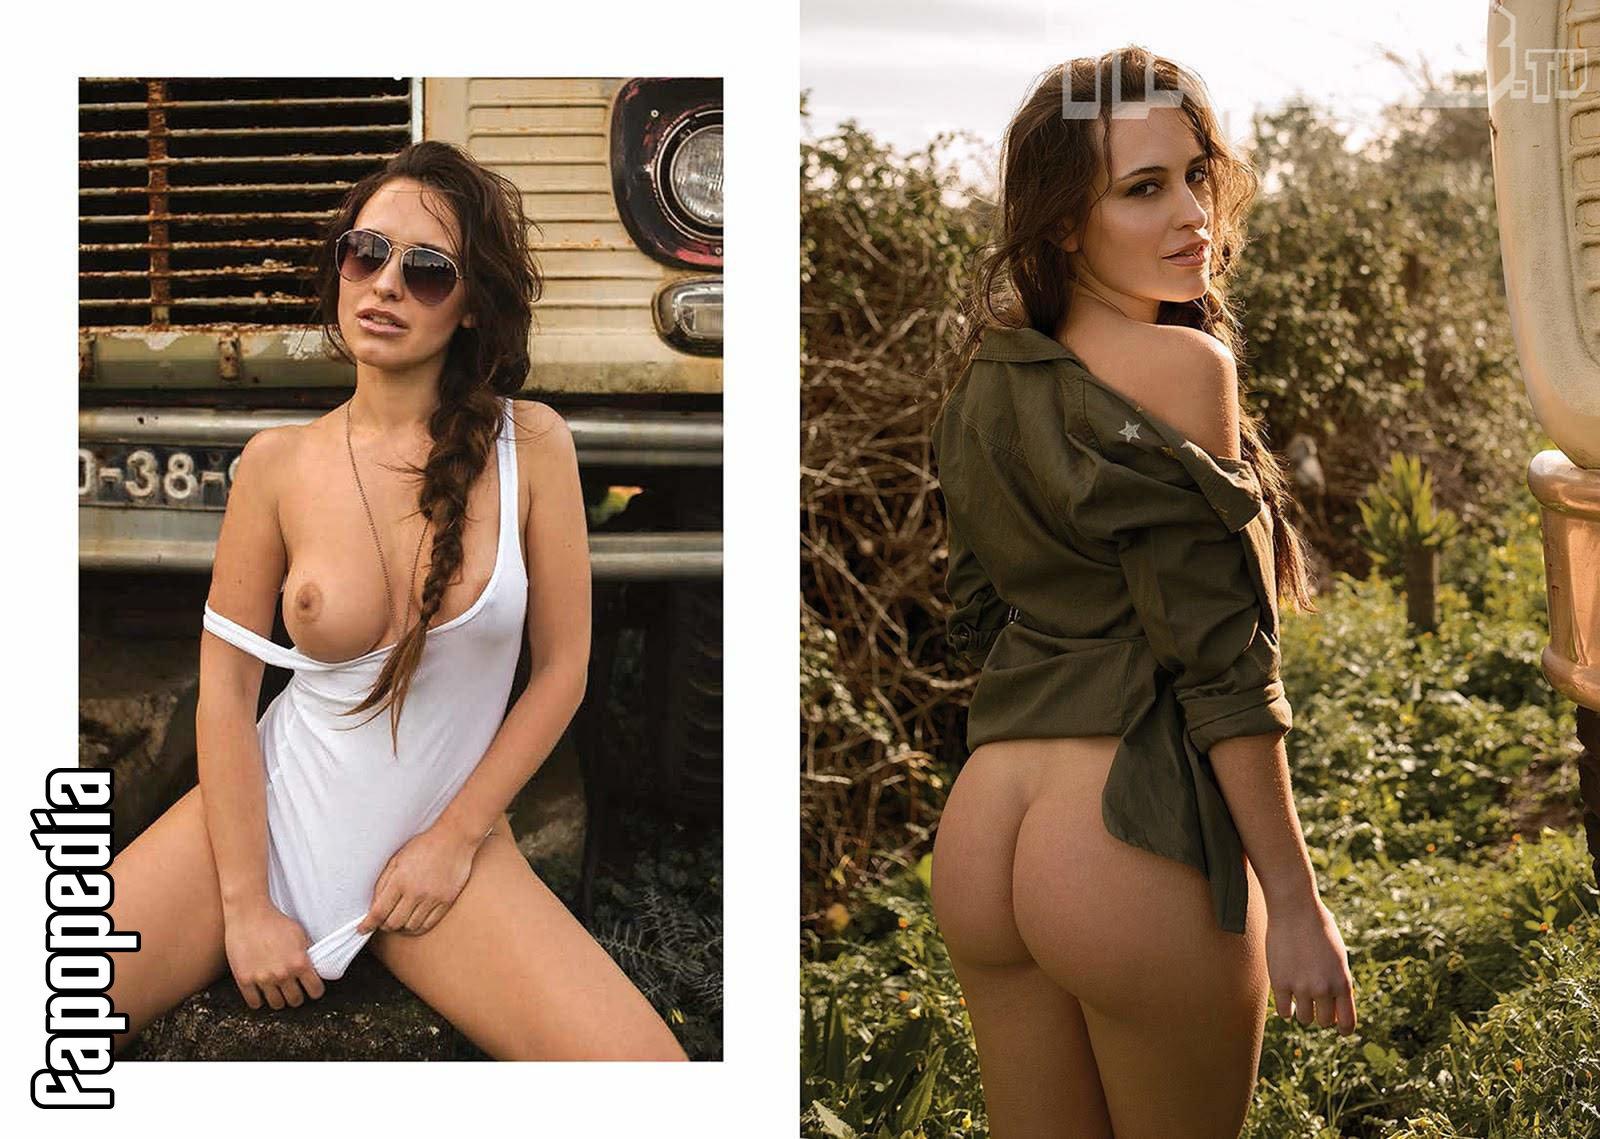 Marie Bx Nude Leaks